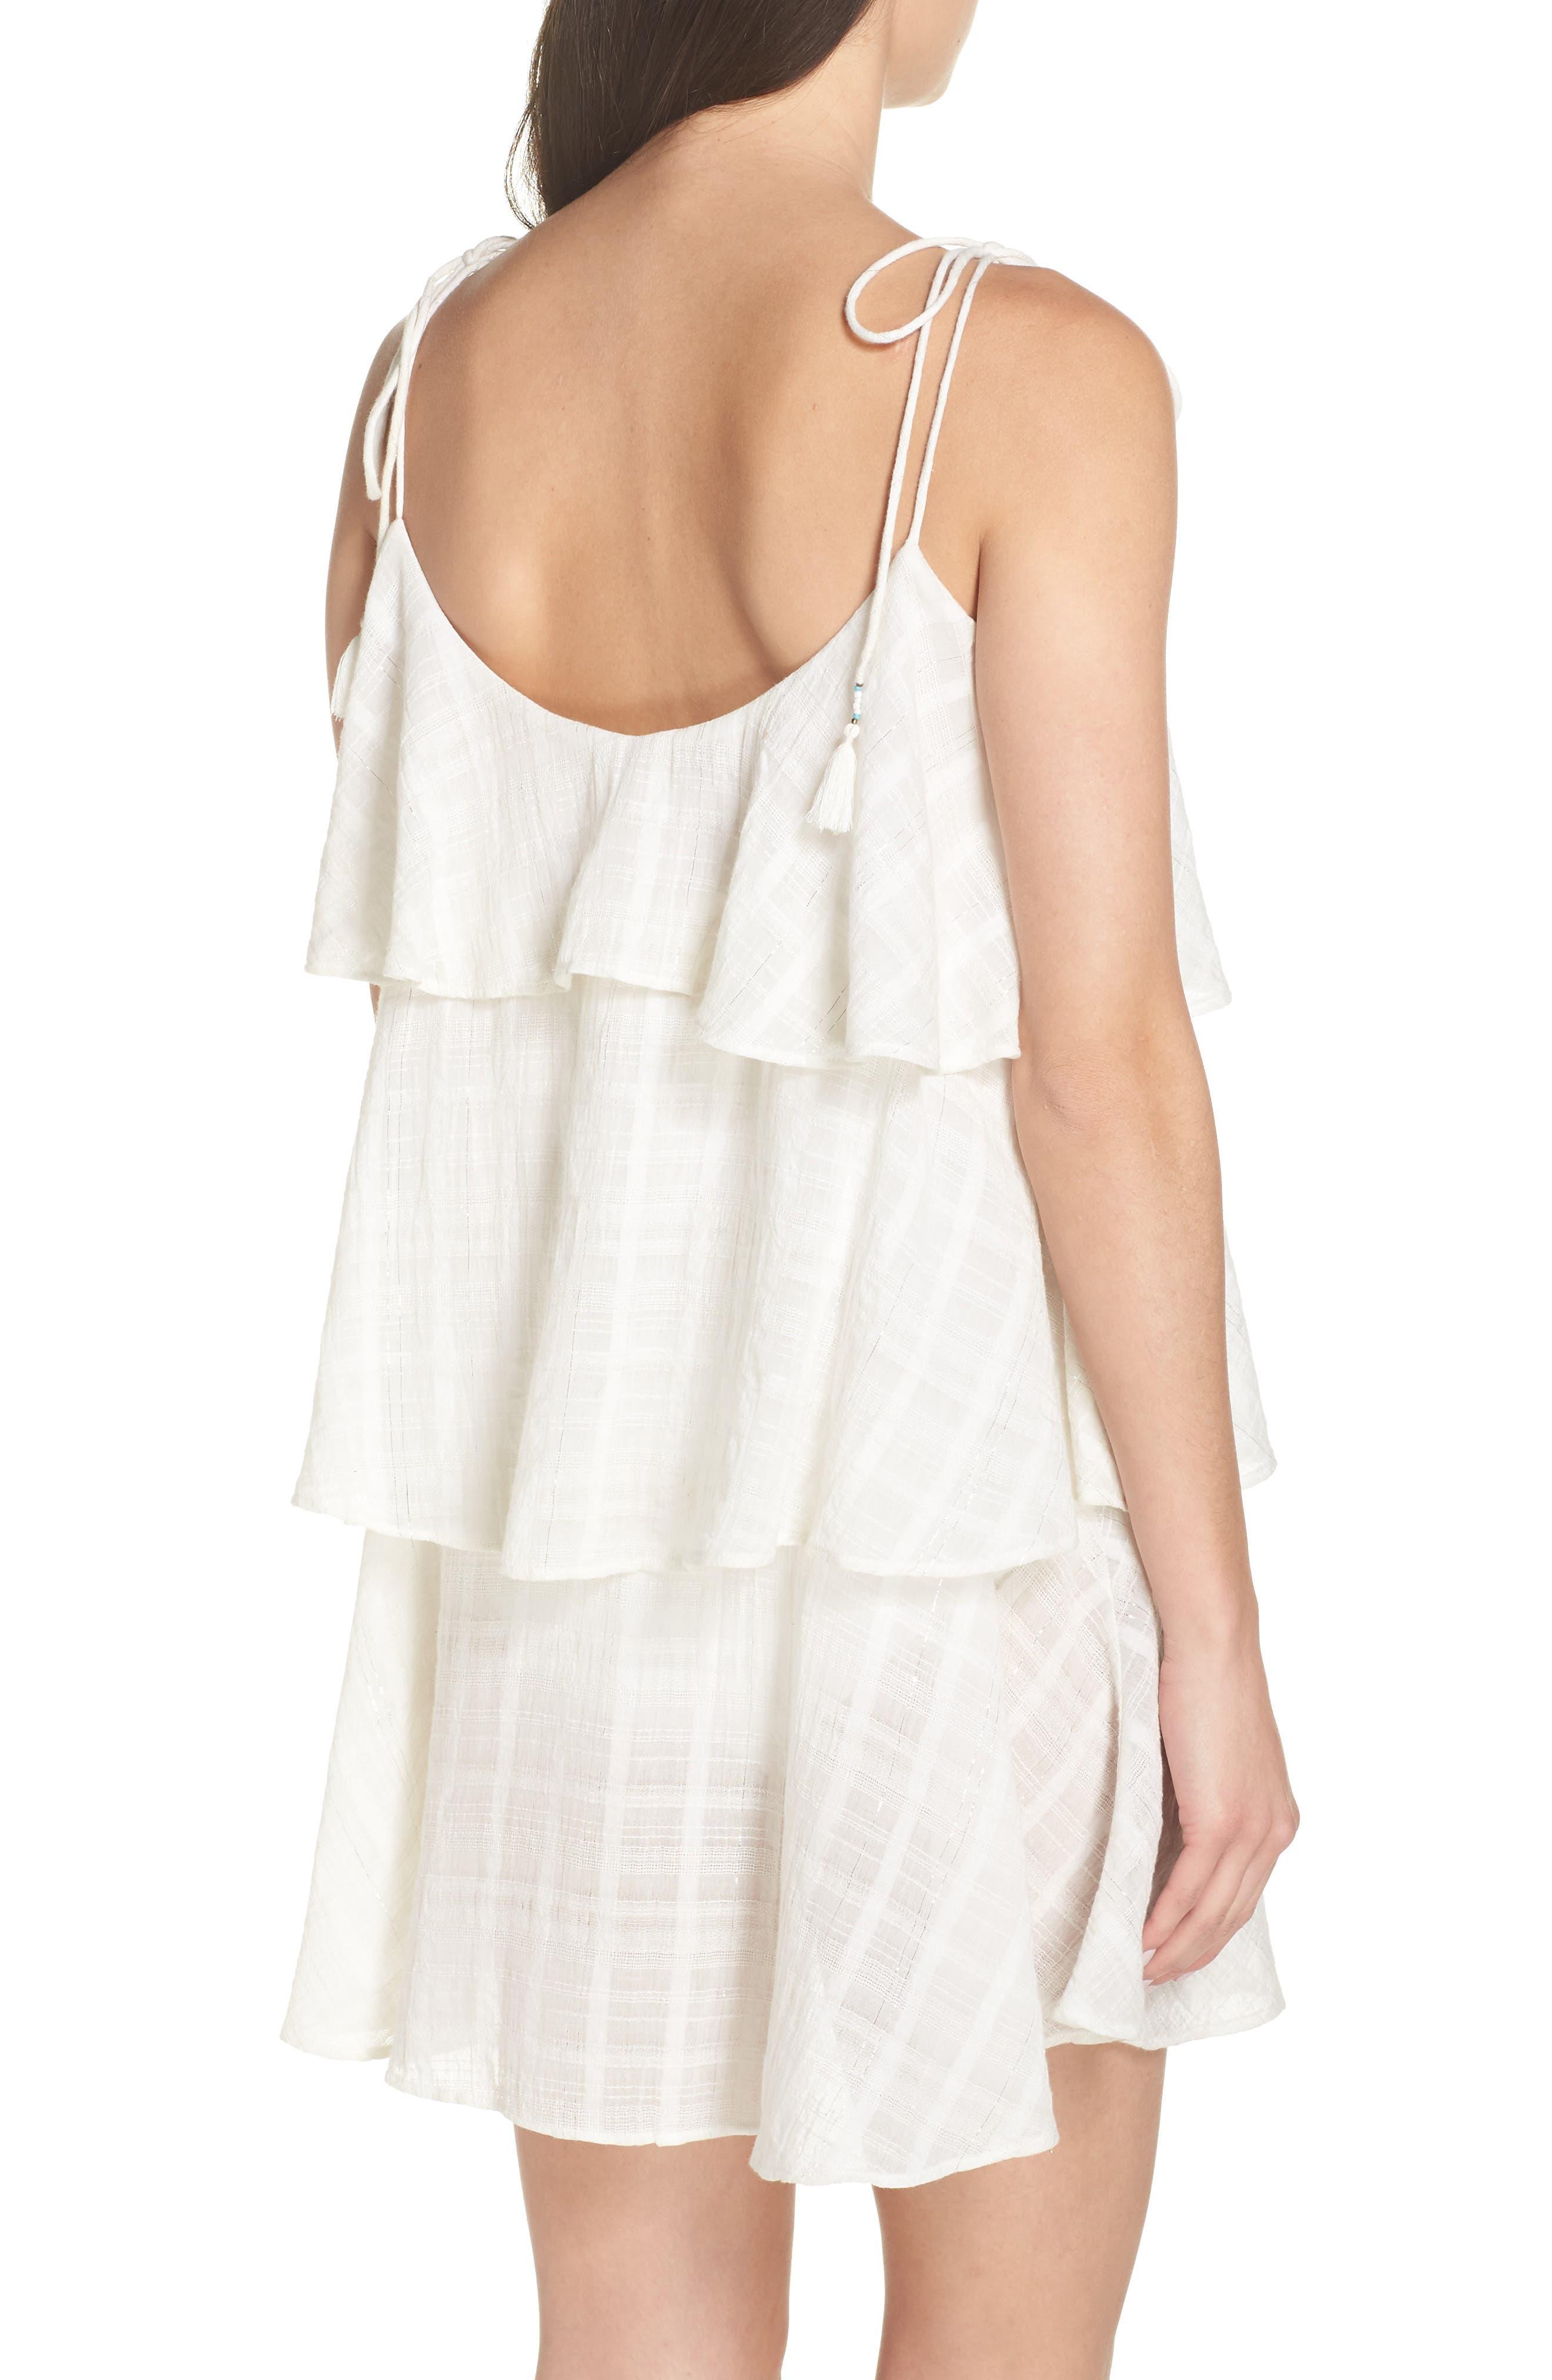 Mariah Ruffled Cover-Up Dress,                             Alternate thumbnail 2, color,                             WHITE-SILVER